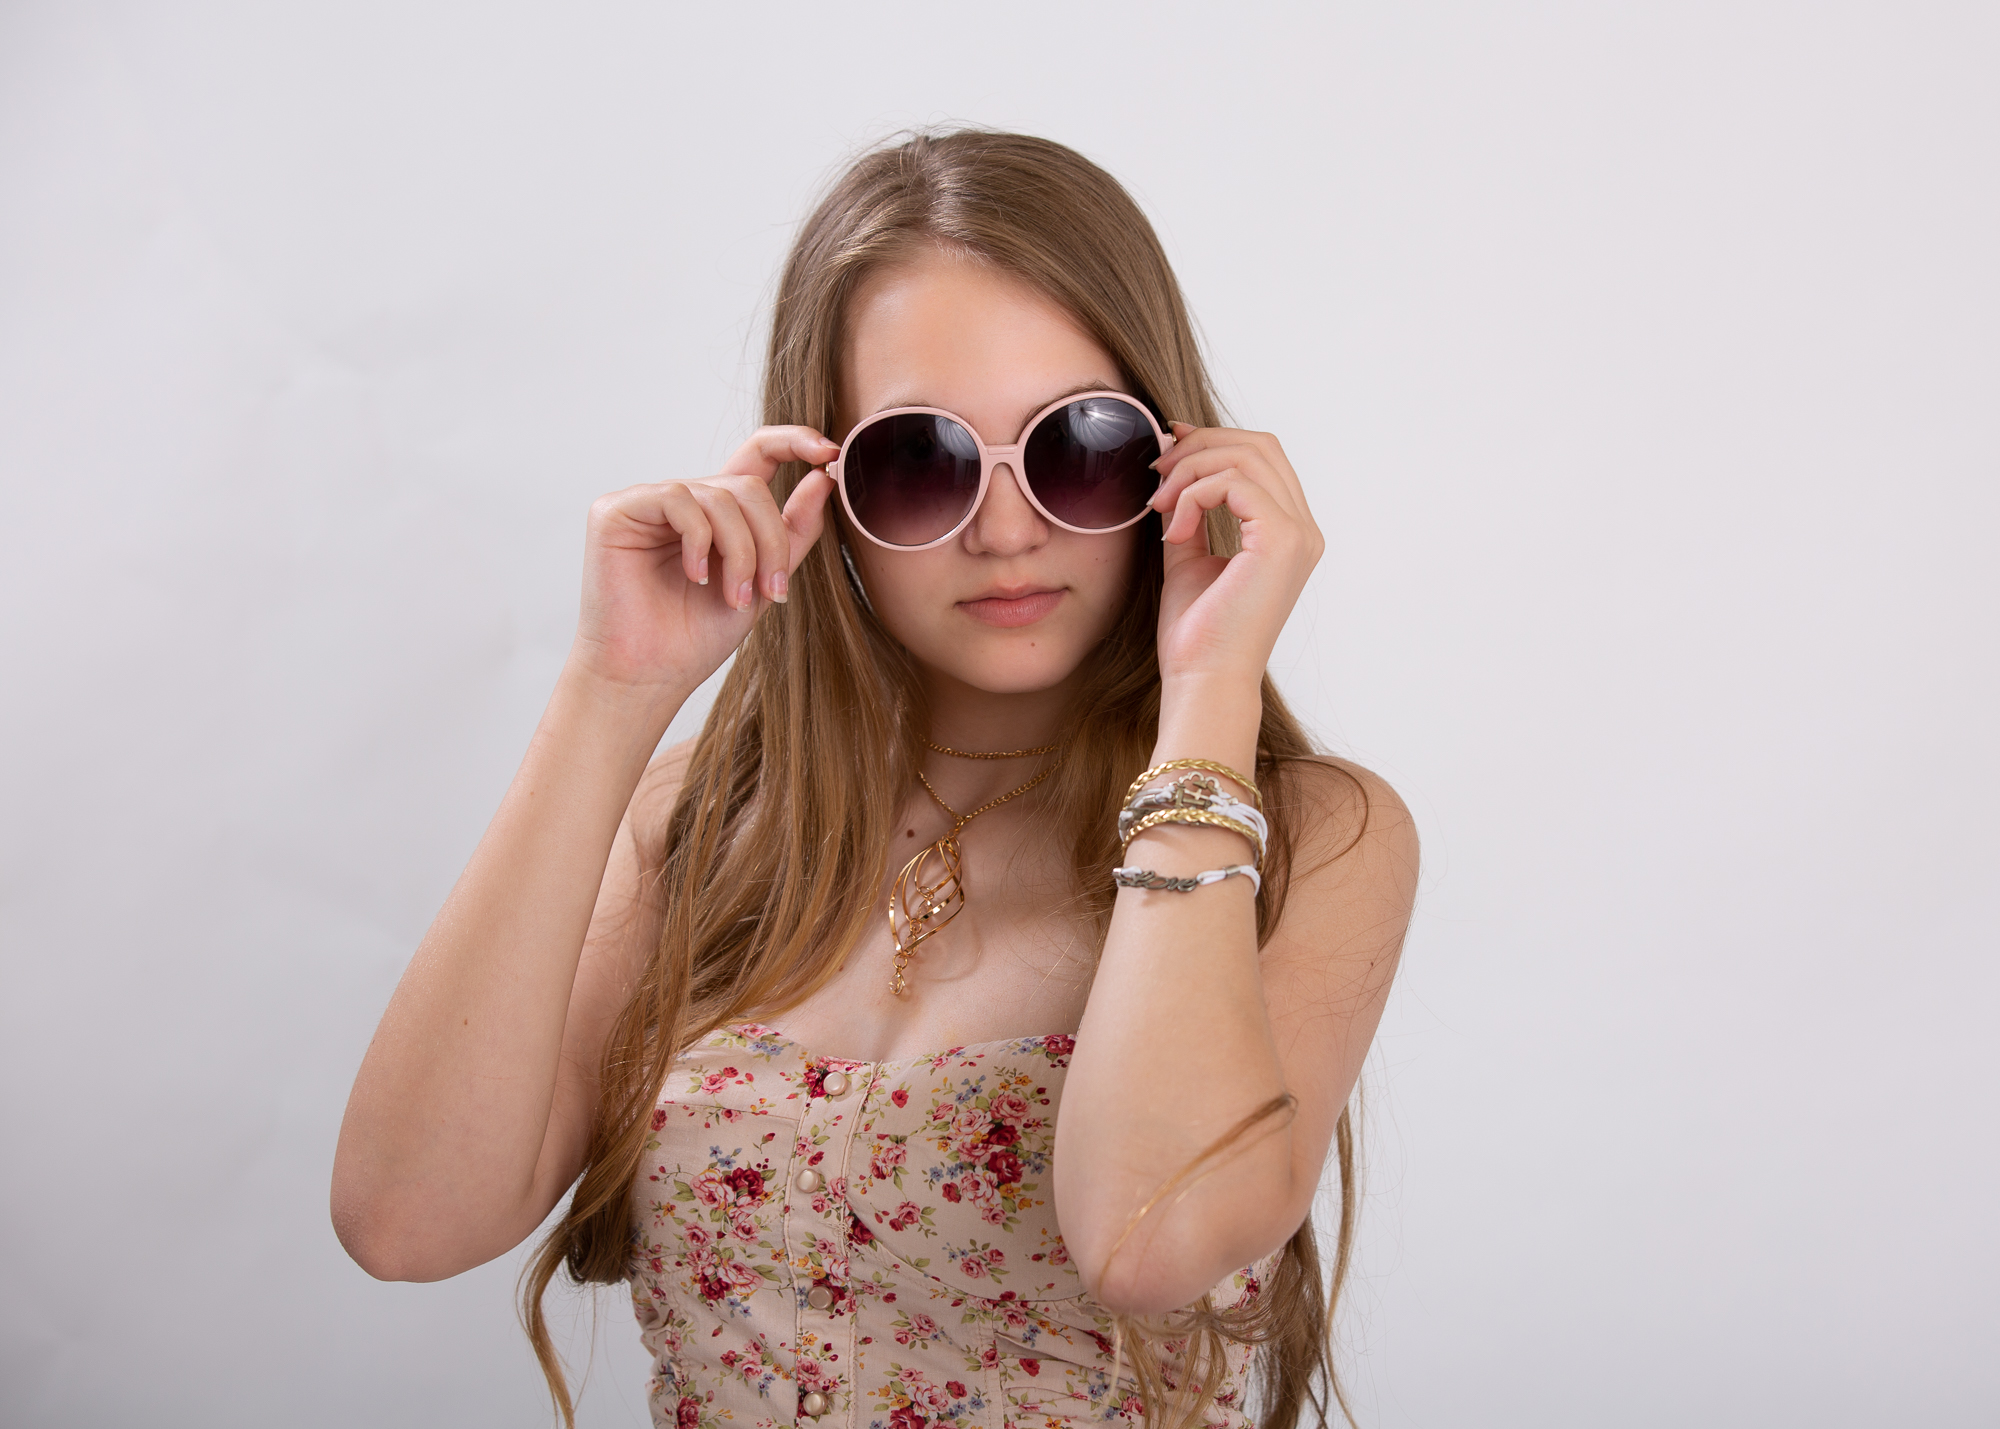 portage-michigan-teen-senior-pictures-Sidney071018-170.jpg